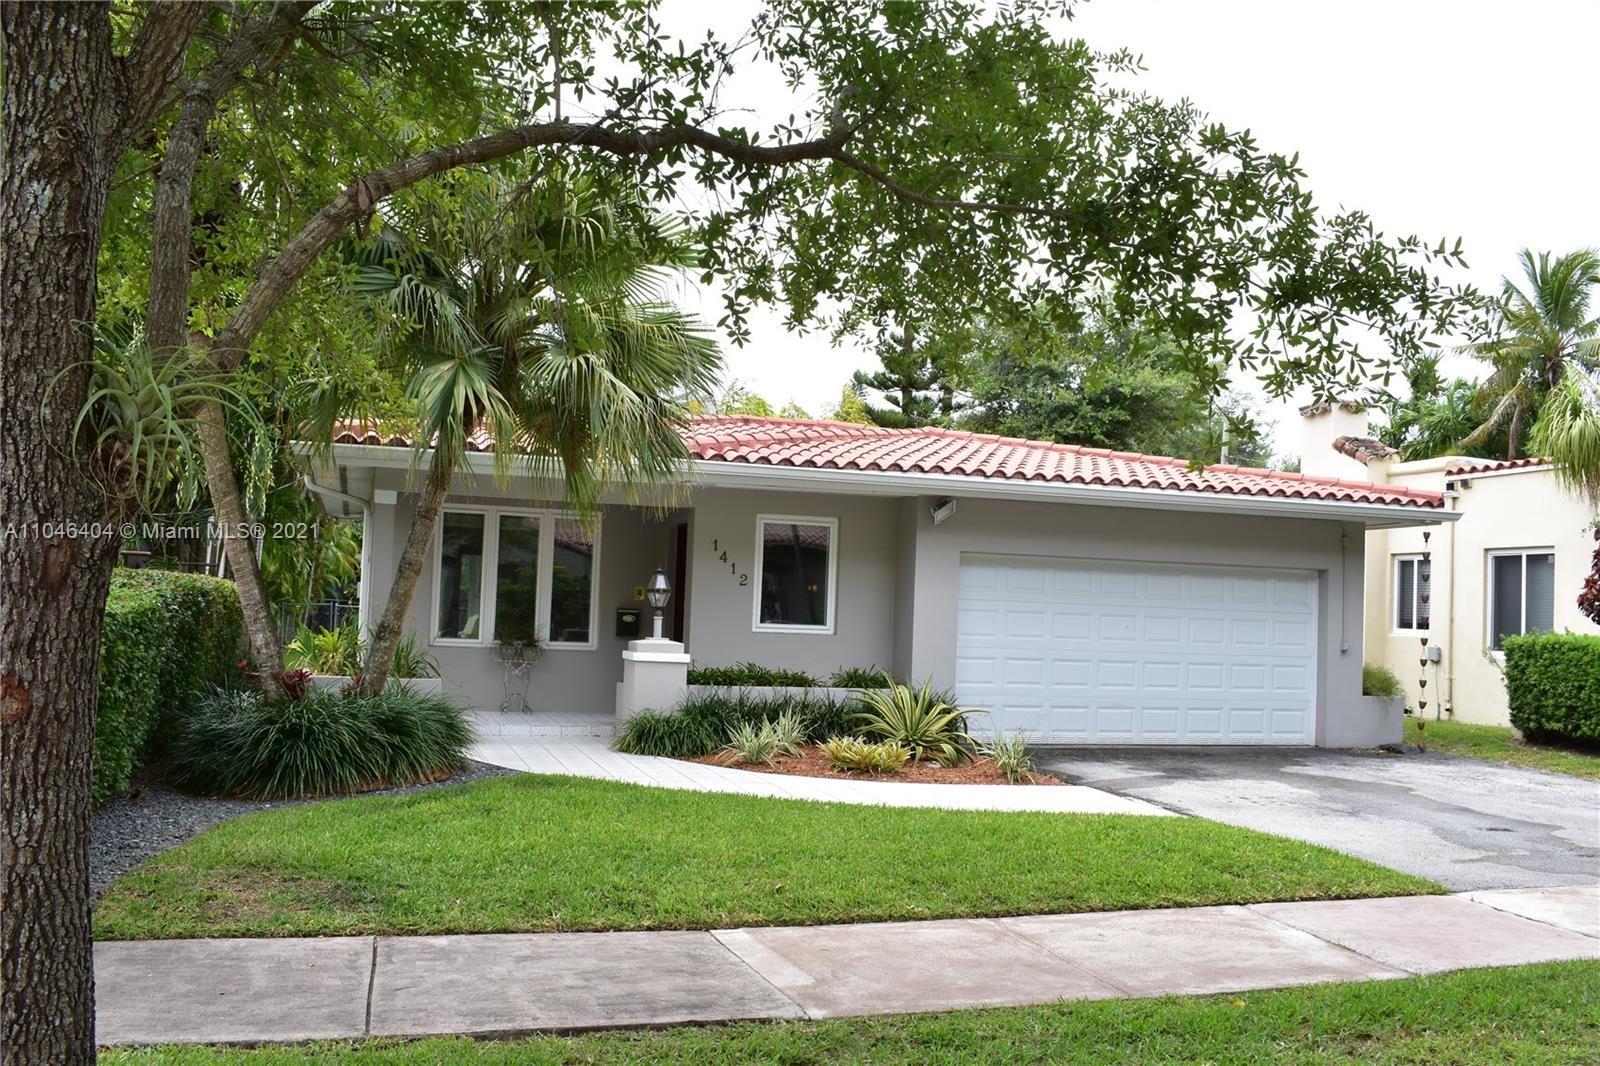 1412 Medina Ave, Coral Gables, FL 33134 - #: A11046404